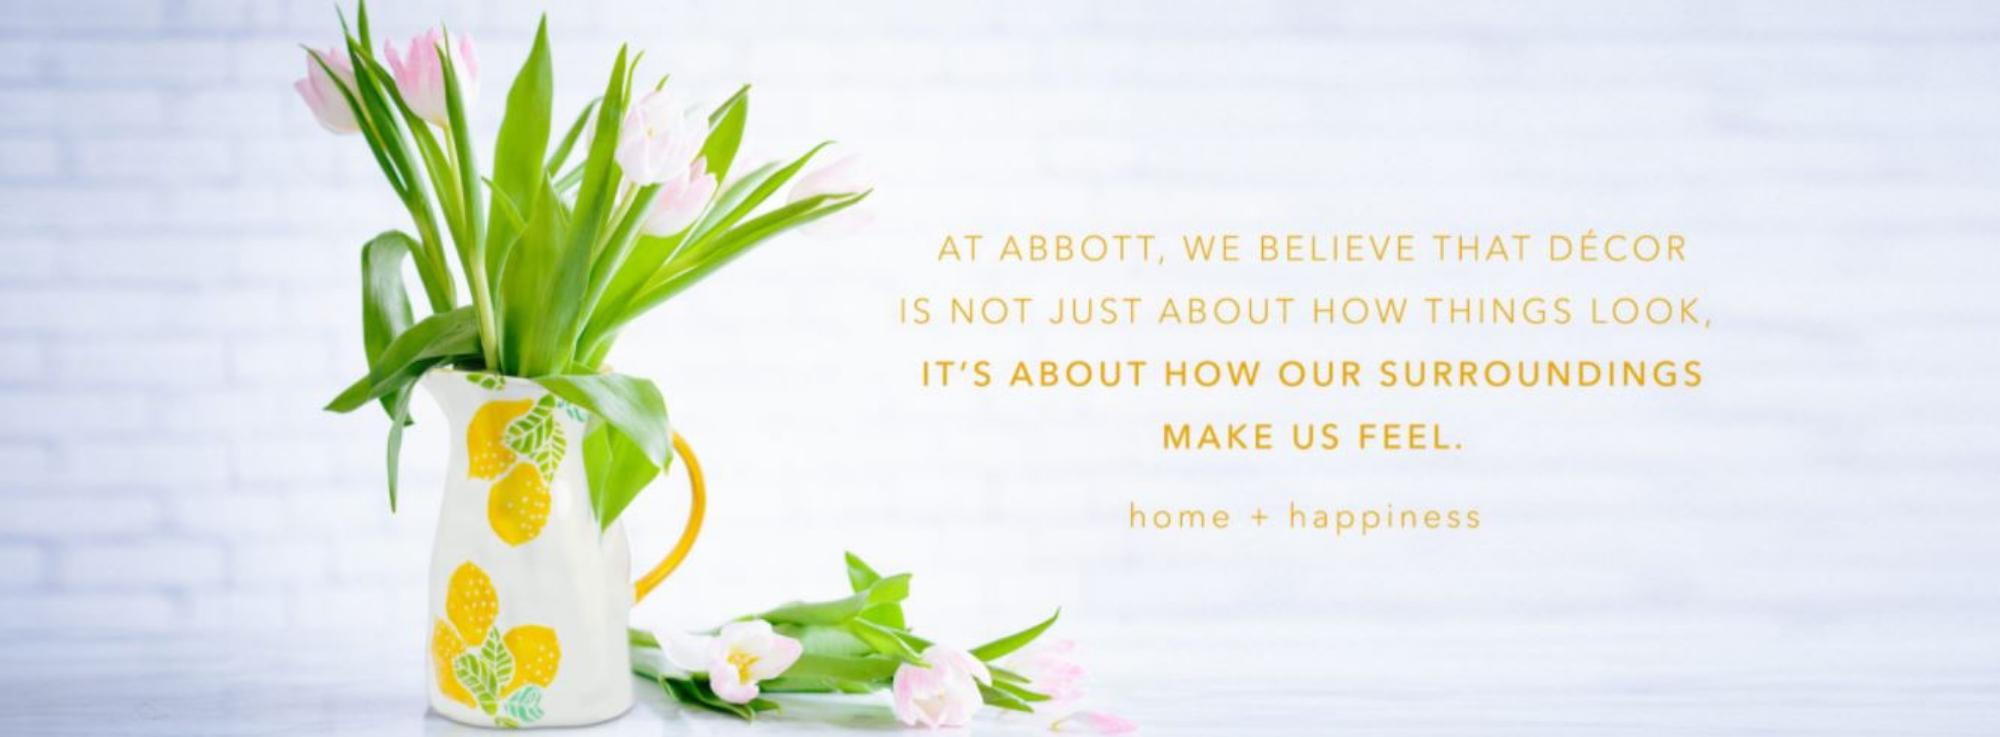 abbott-brand-banner-3.png